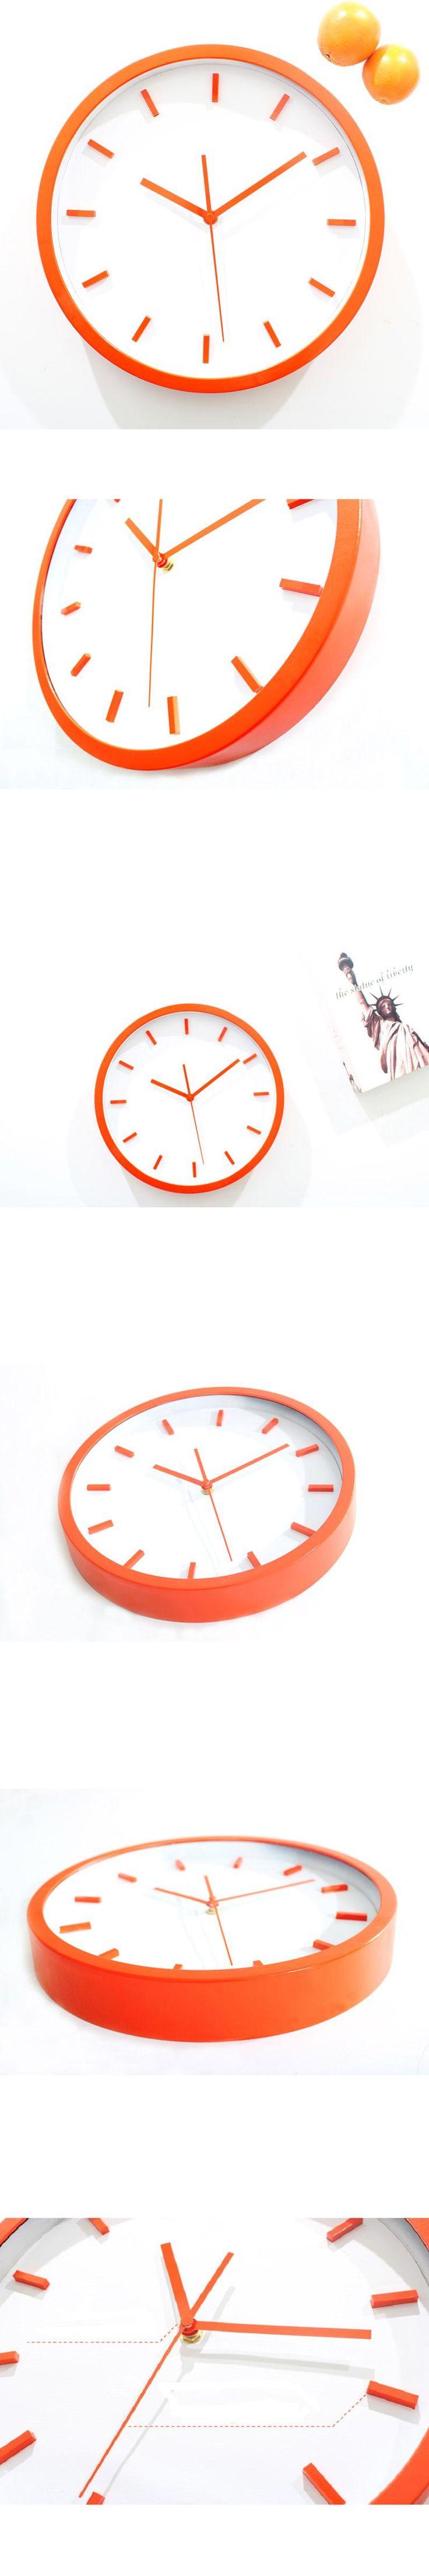 Best 25 orange wall clocks ideas on pinterest retro kitchen saat clock 3d orange wall clock reloj relogio de parede reloj de pared wall horloge murale amipublicfo Image collections